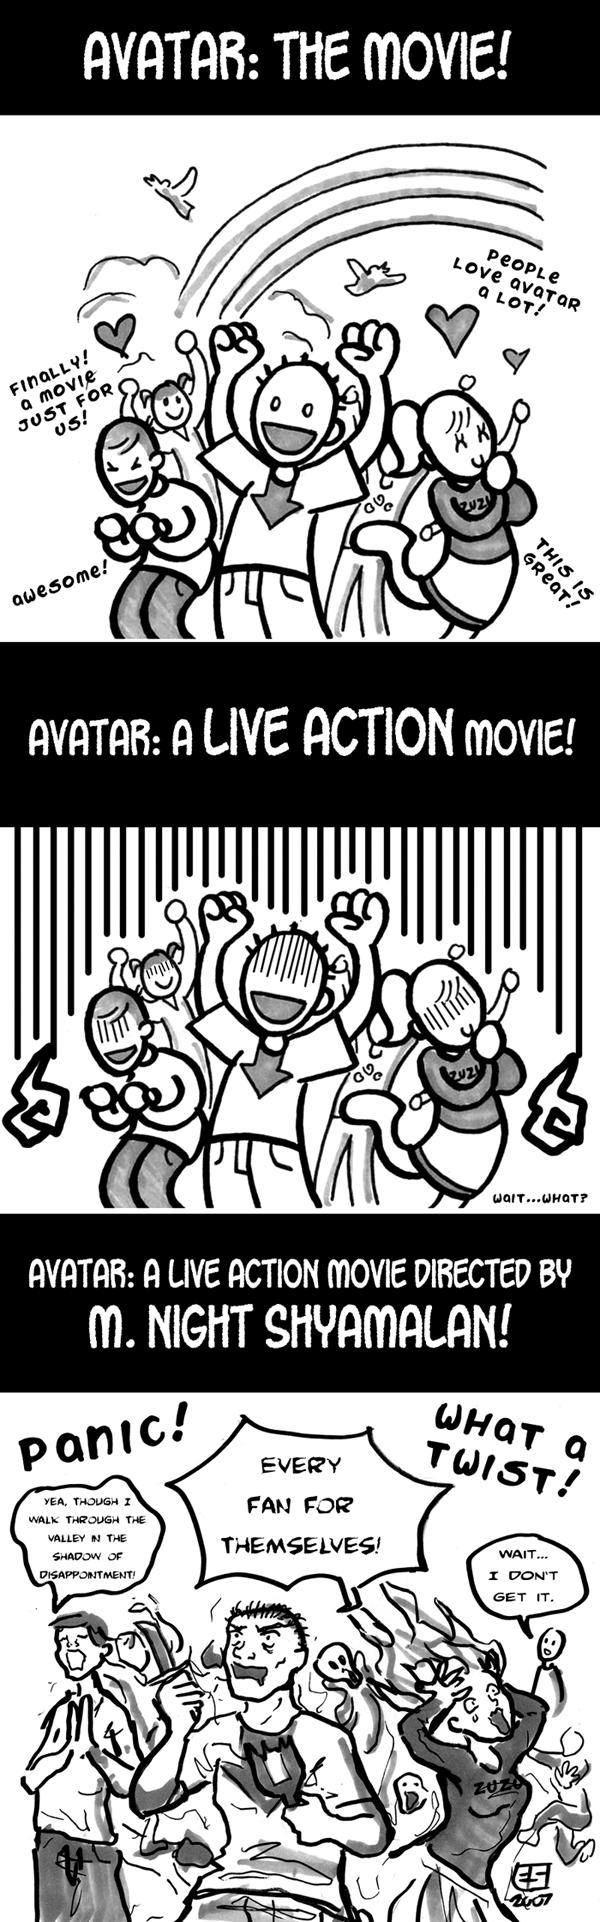 Avatar The Movie. Found it on Deviantart, thanks to the author. avatar Movie shayallama